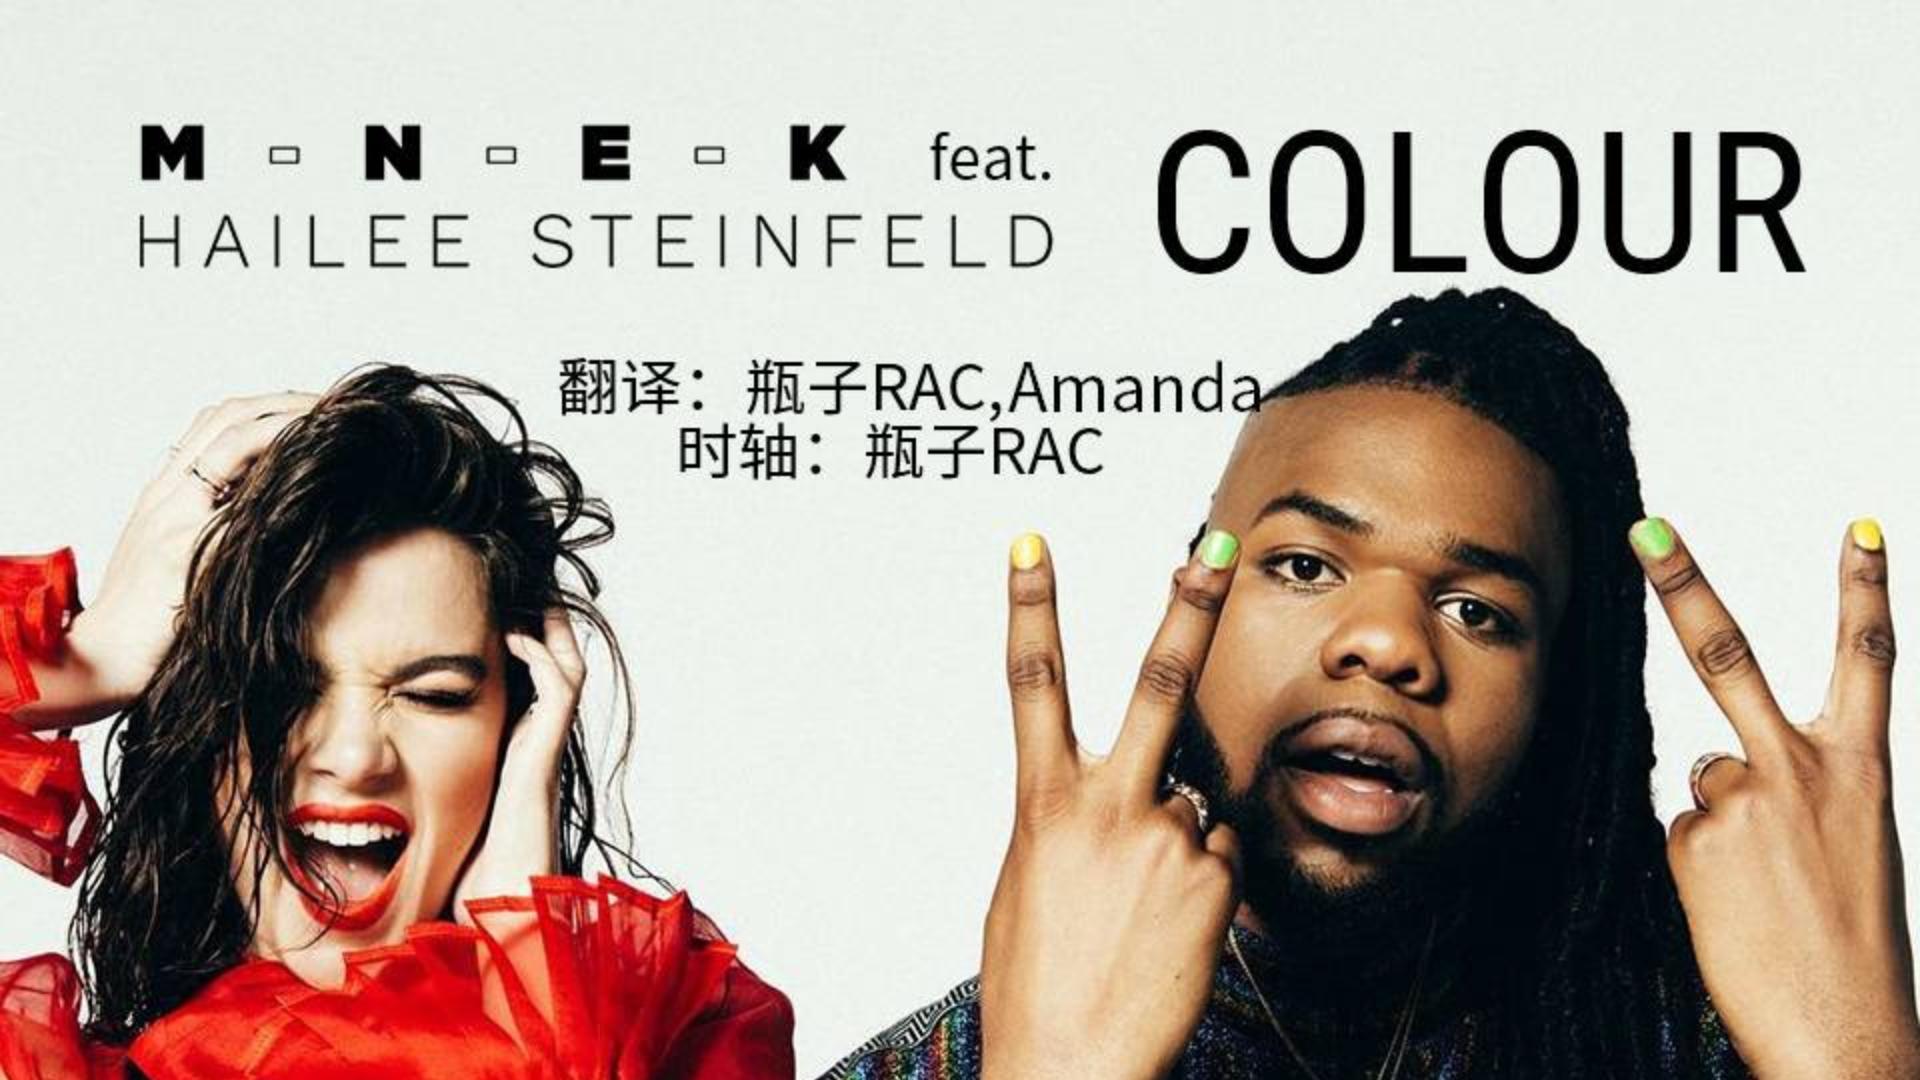 【1080P中英字幕】MNEK - Colour (feat. Hailee Steinfeld)